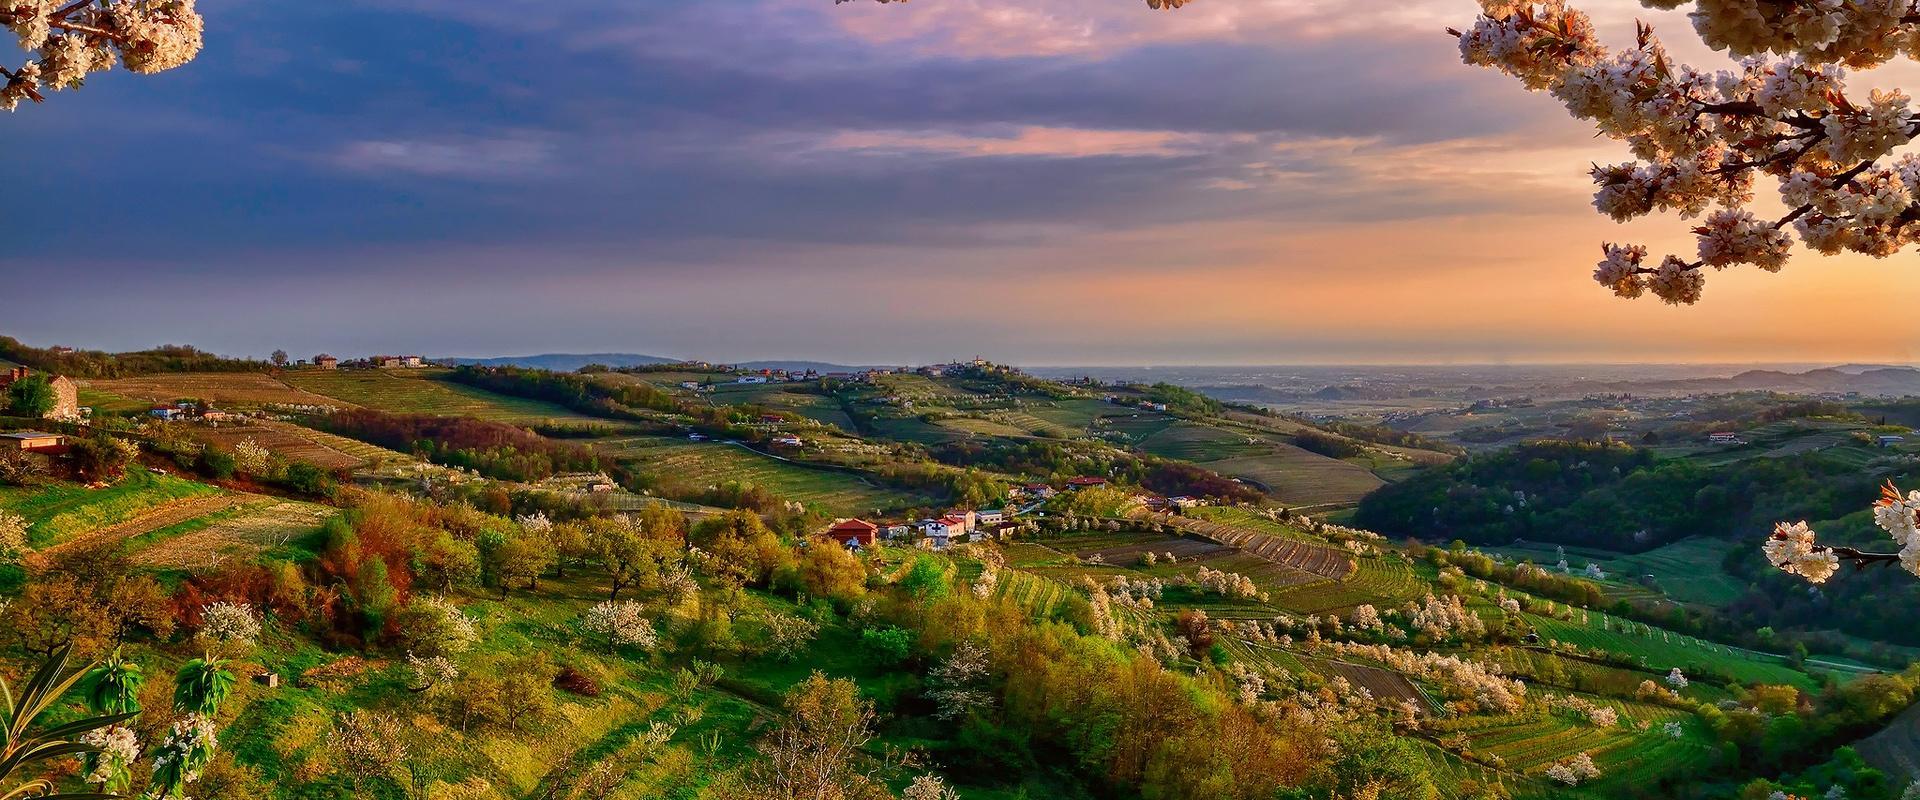 Tour Veneto  Where the wine become poetry!